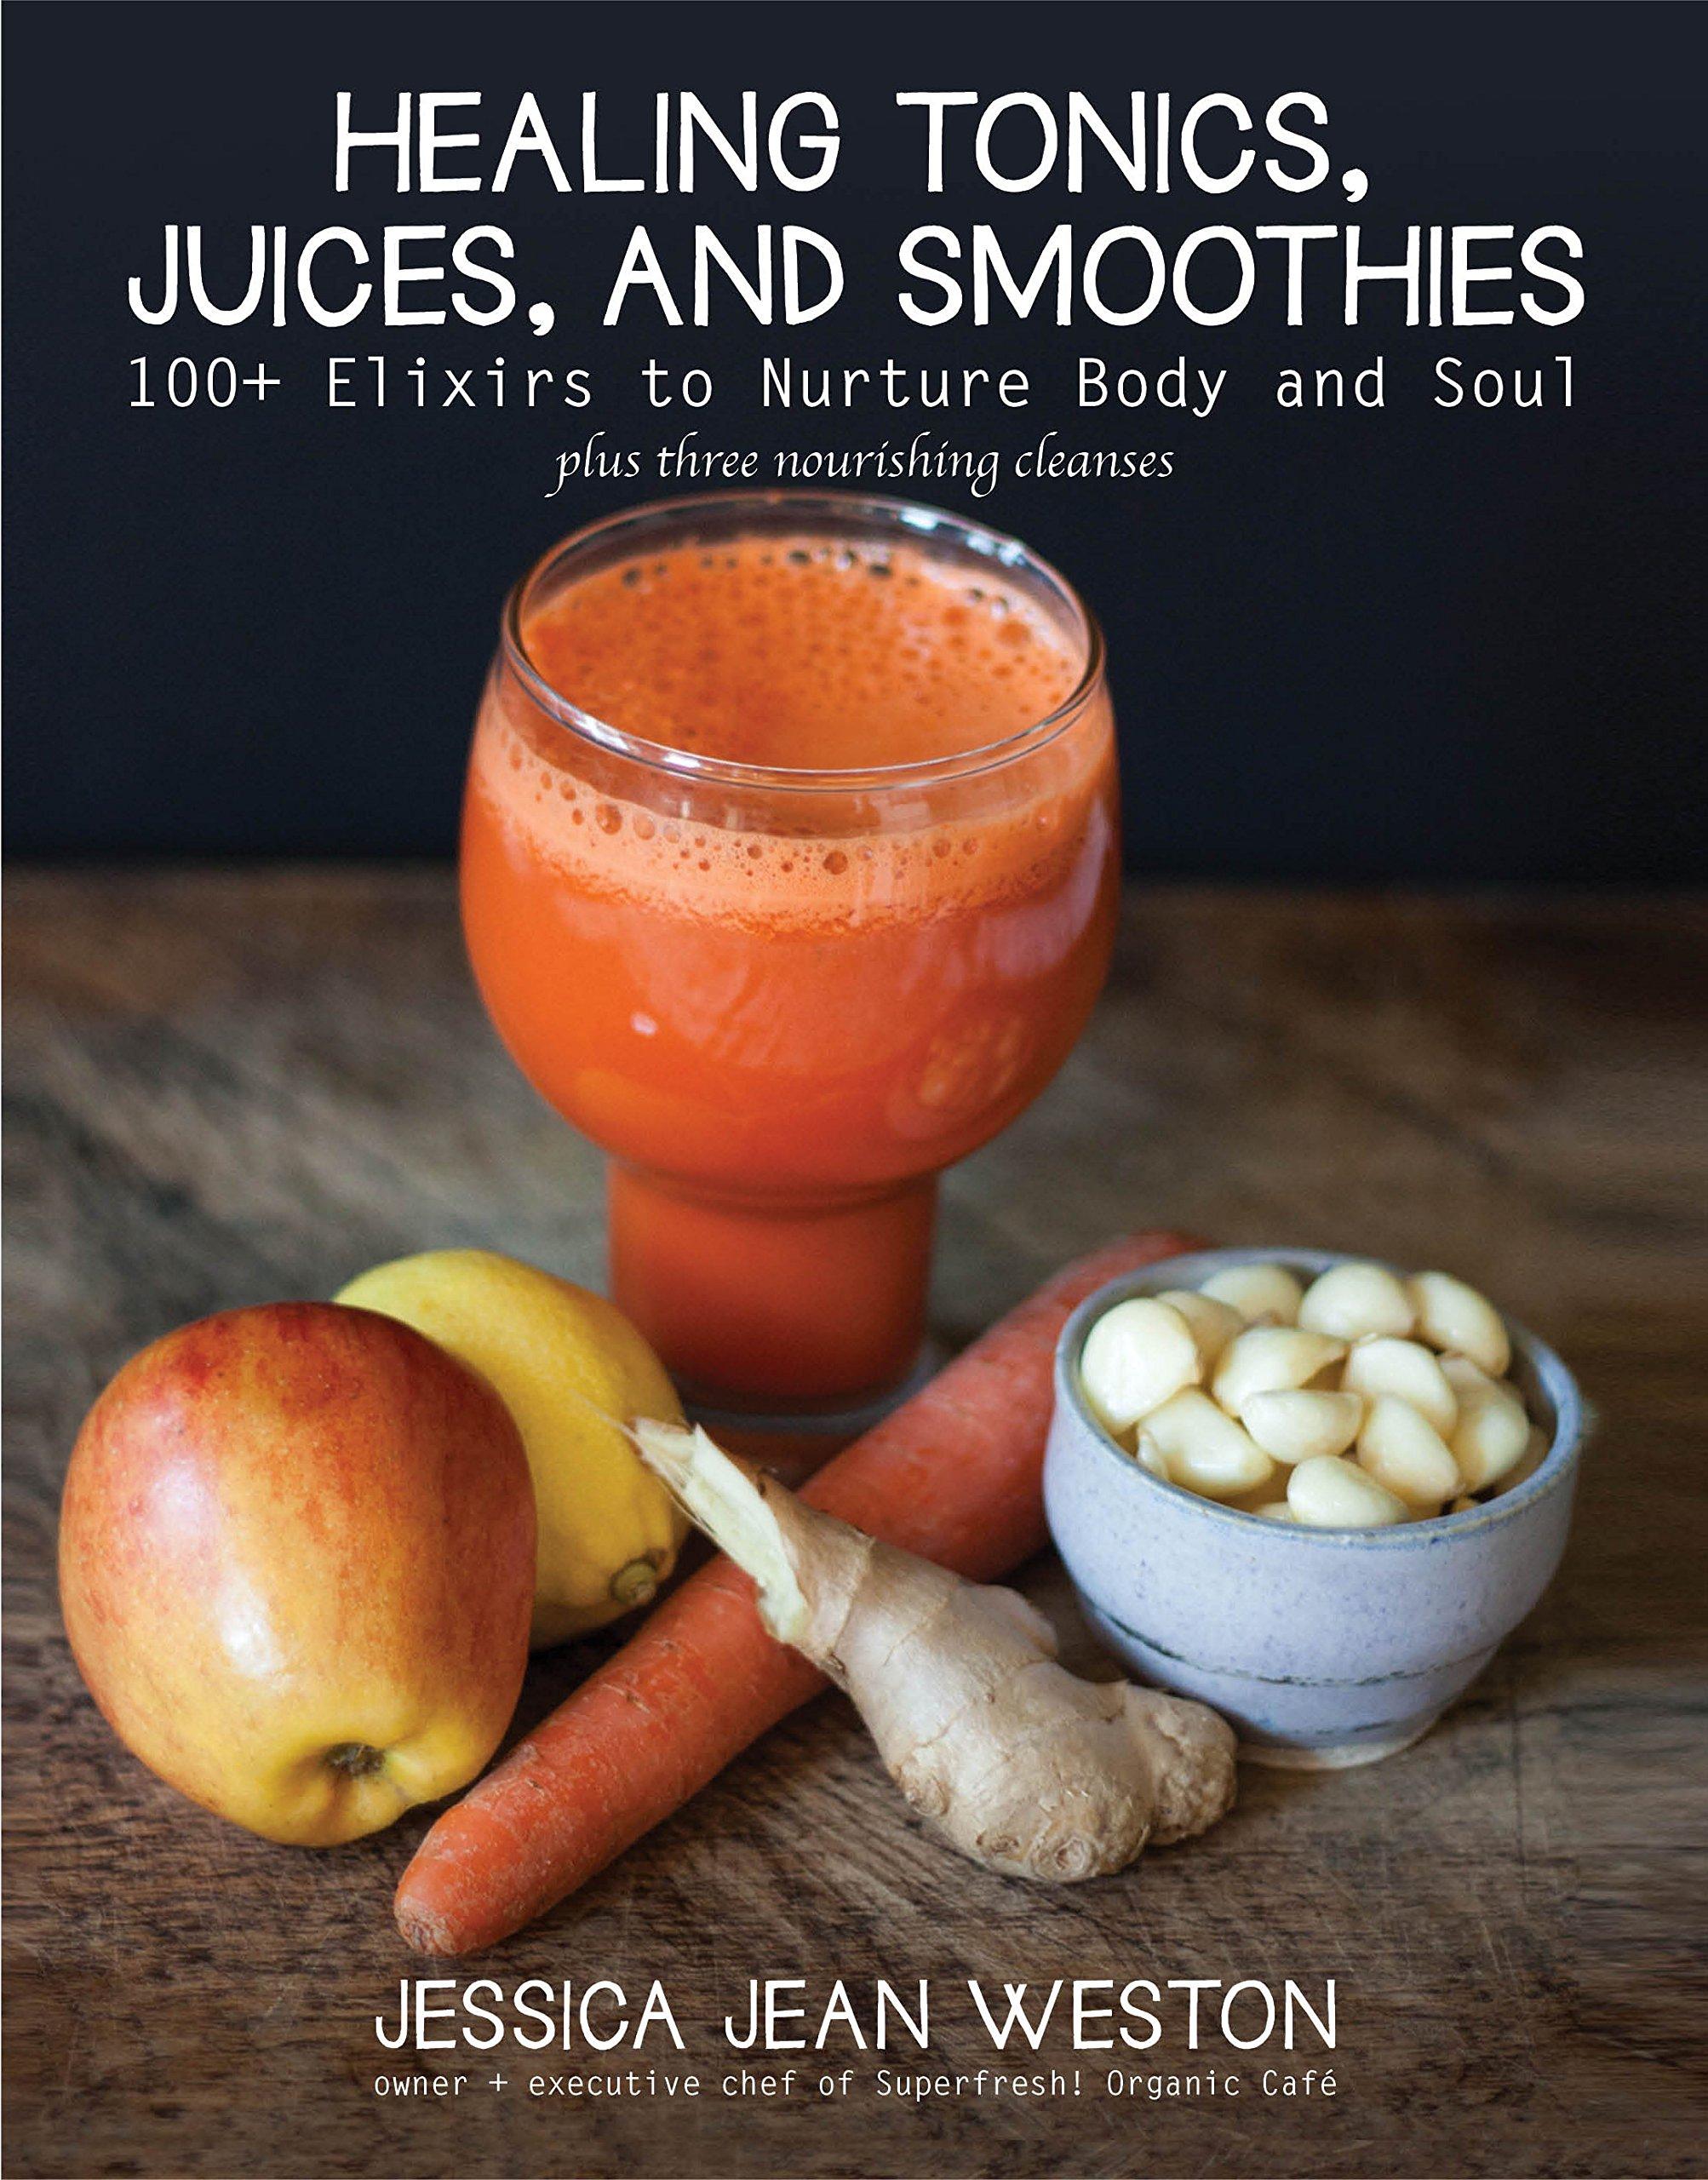 Healing Tonics Juices Smoothies Elixirs product image